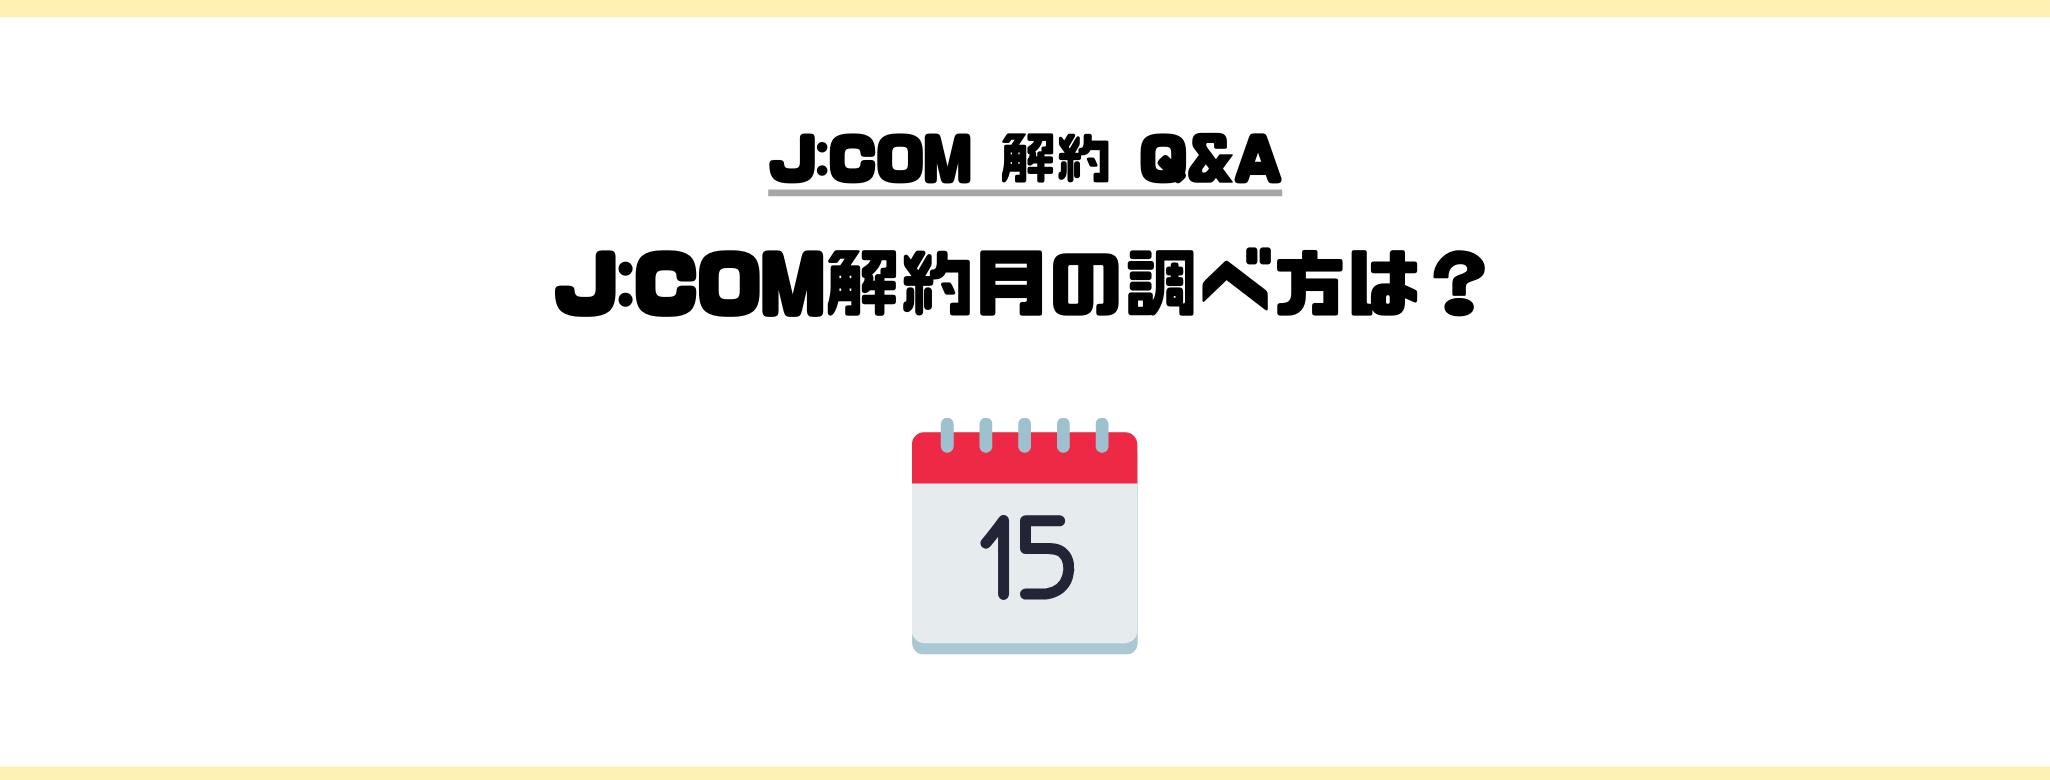 J:COM_解約_解約月_調べ方